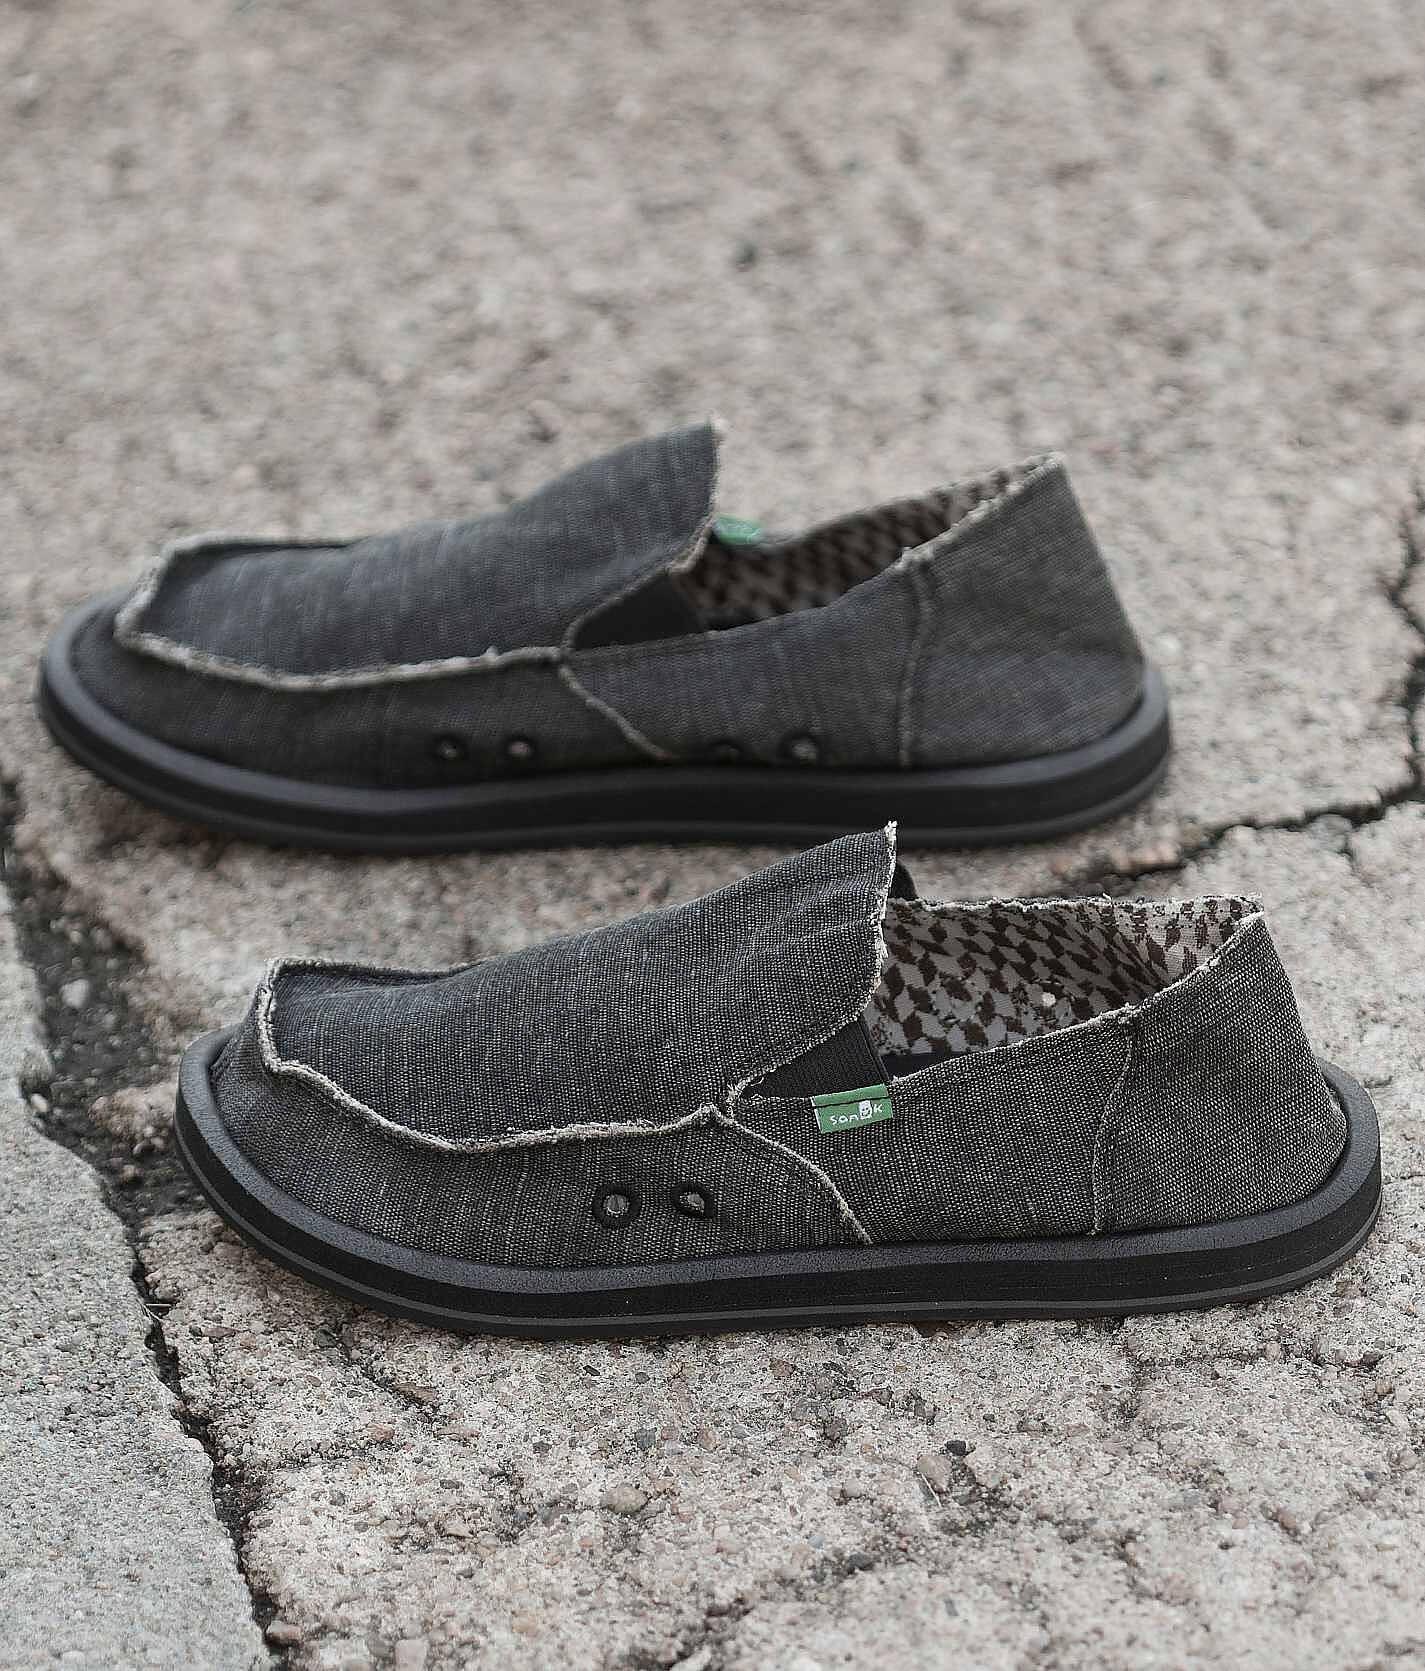 Sanuk Vega Bound Surfer Shoe